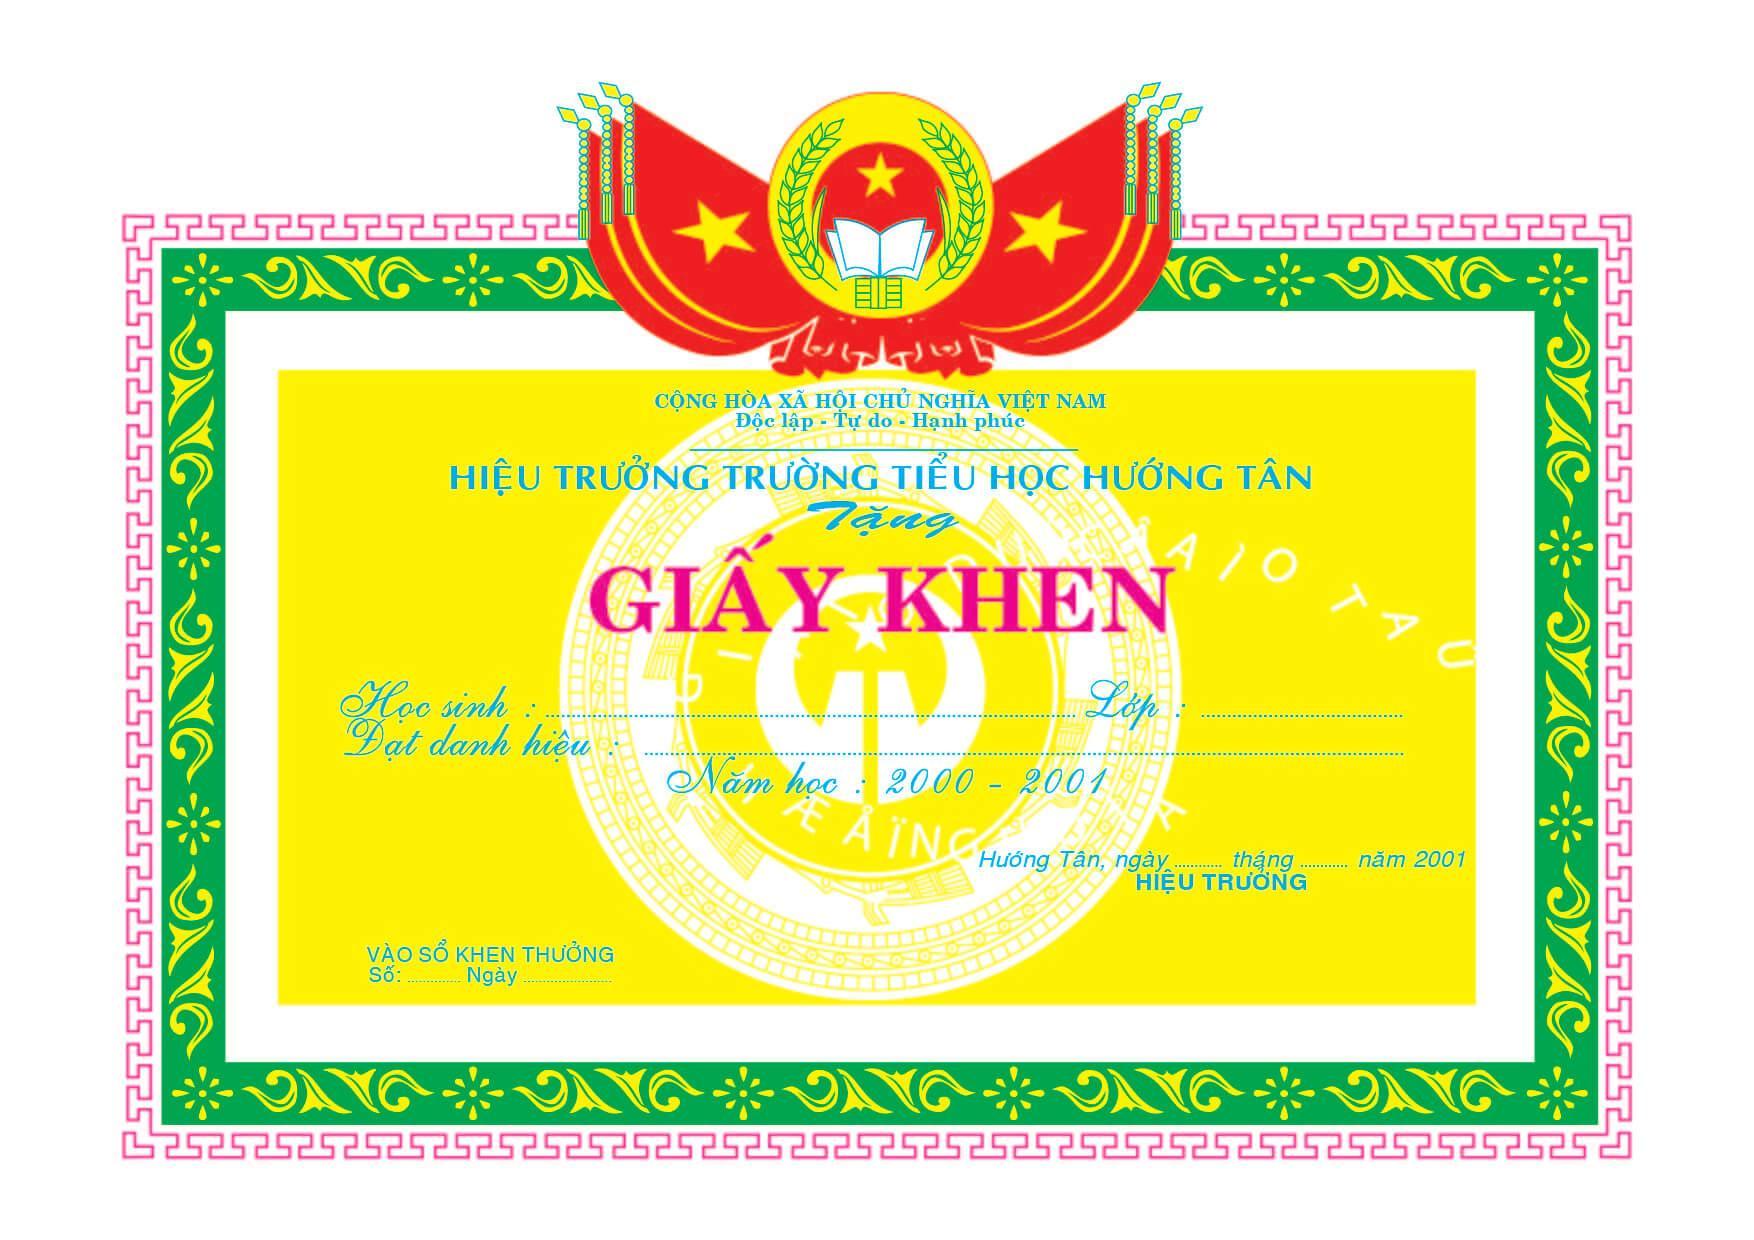 Mẫu giấy khen 020 - mẫu giấy khen trường tiểu học - Link Download : https://adsnew.net/LWc2